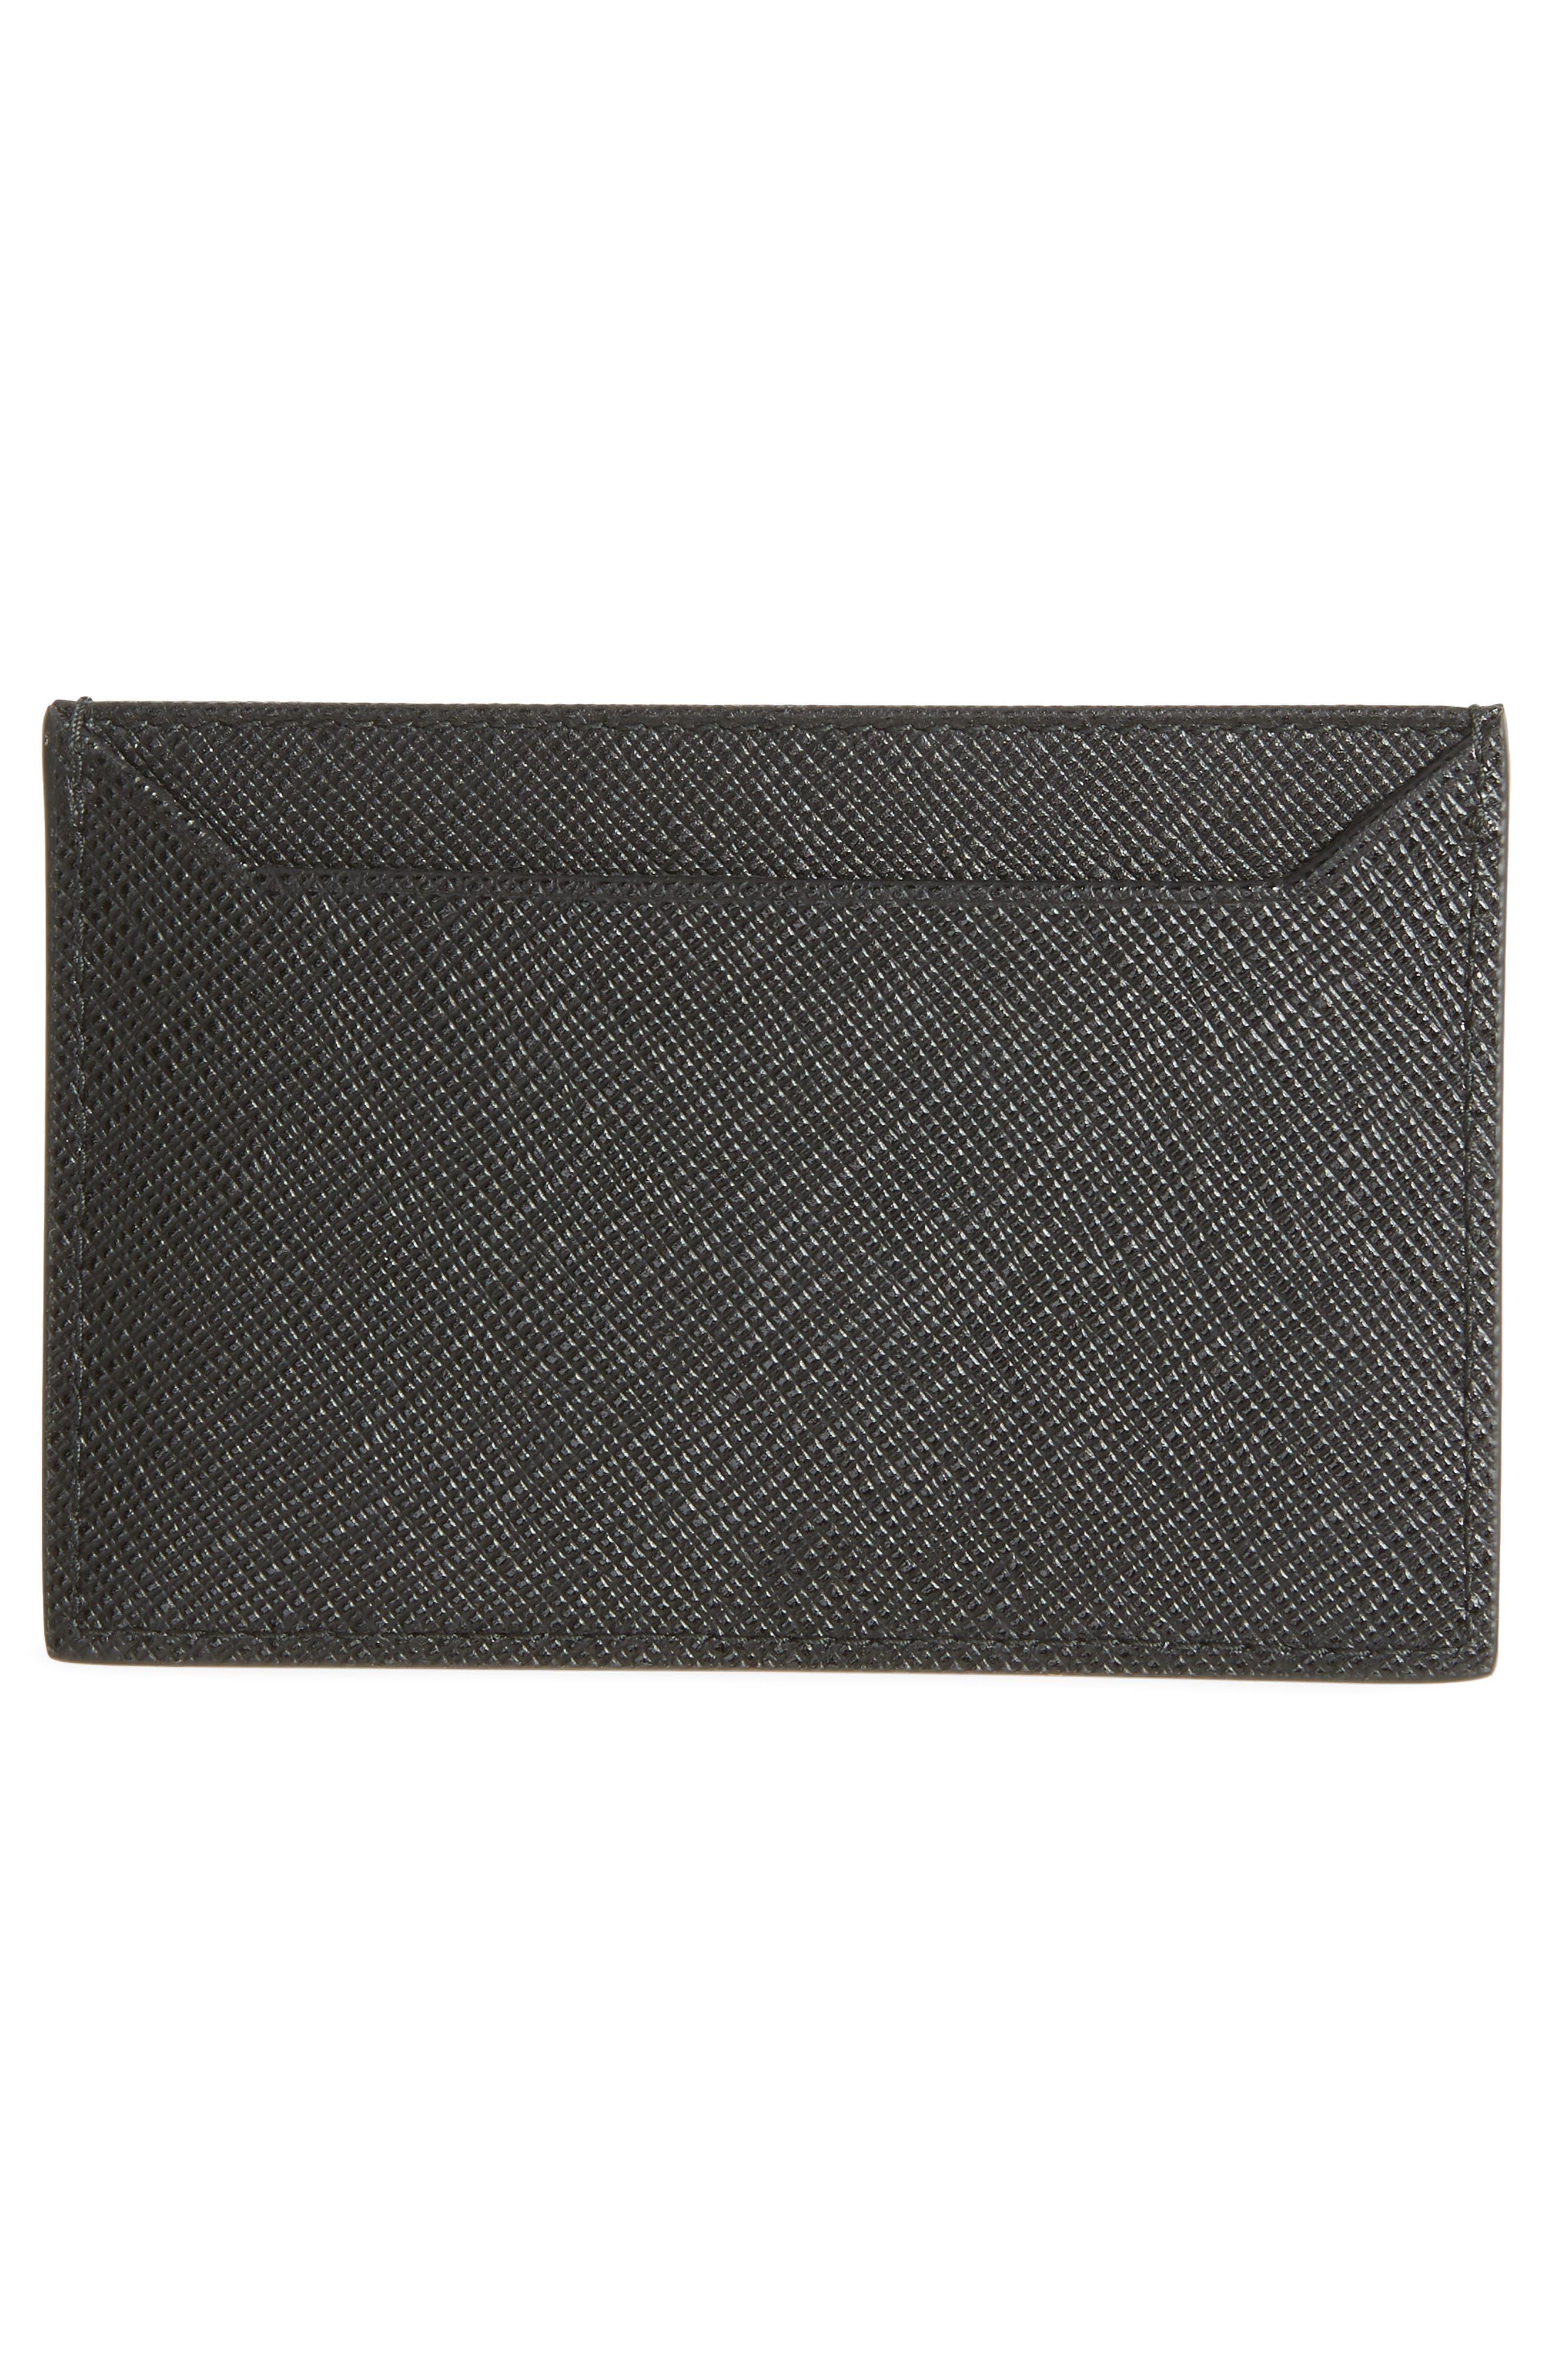 Saffiano Leather Card Case,                             Alternate thumbnail 2, color,                             NERO